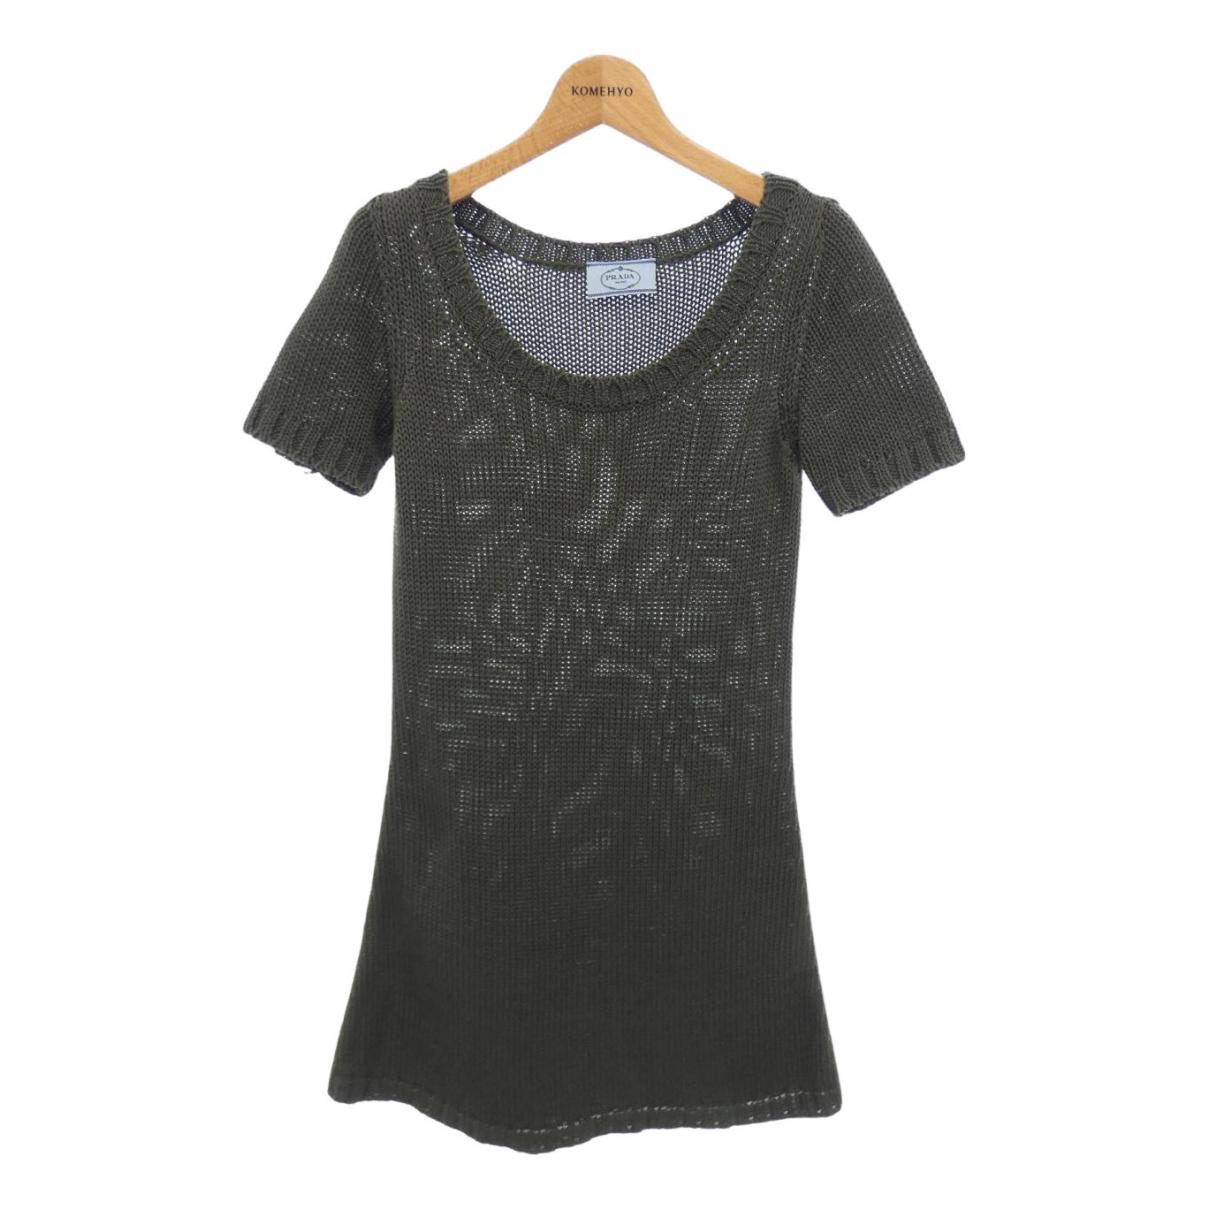 Prada \N Kleid in  Schwarz Polyester